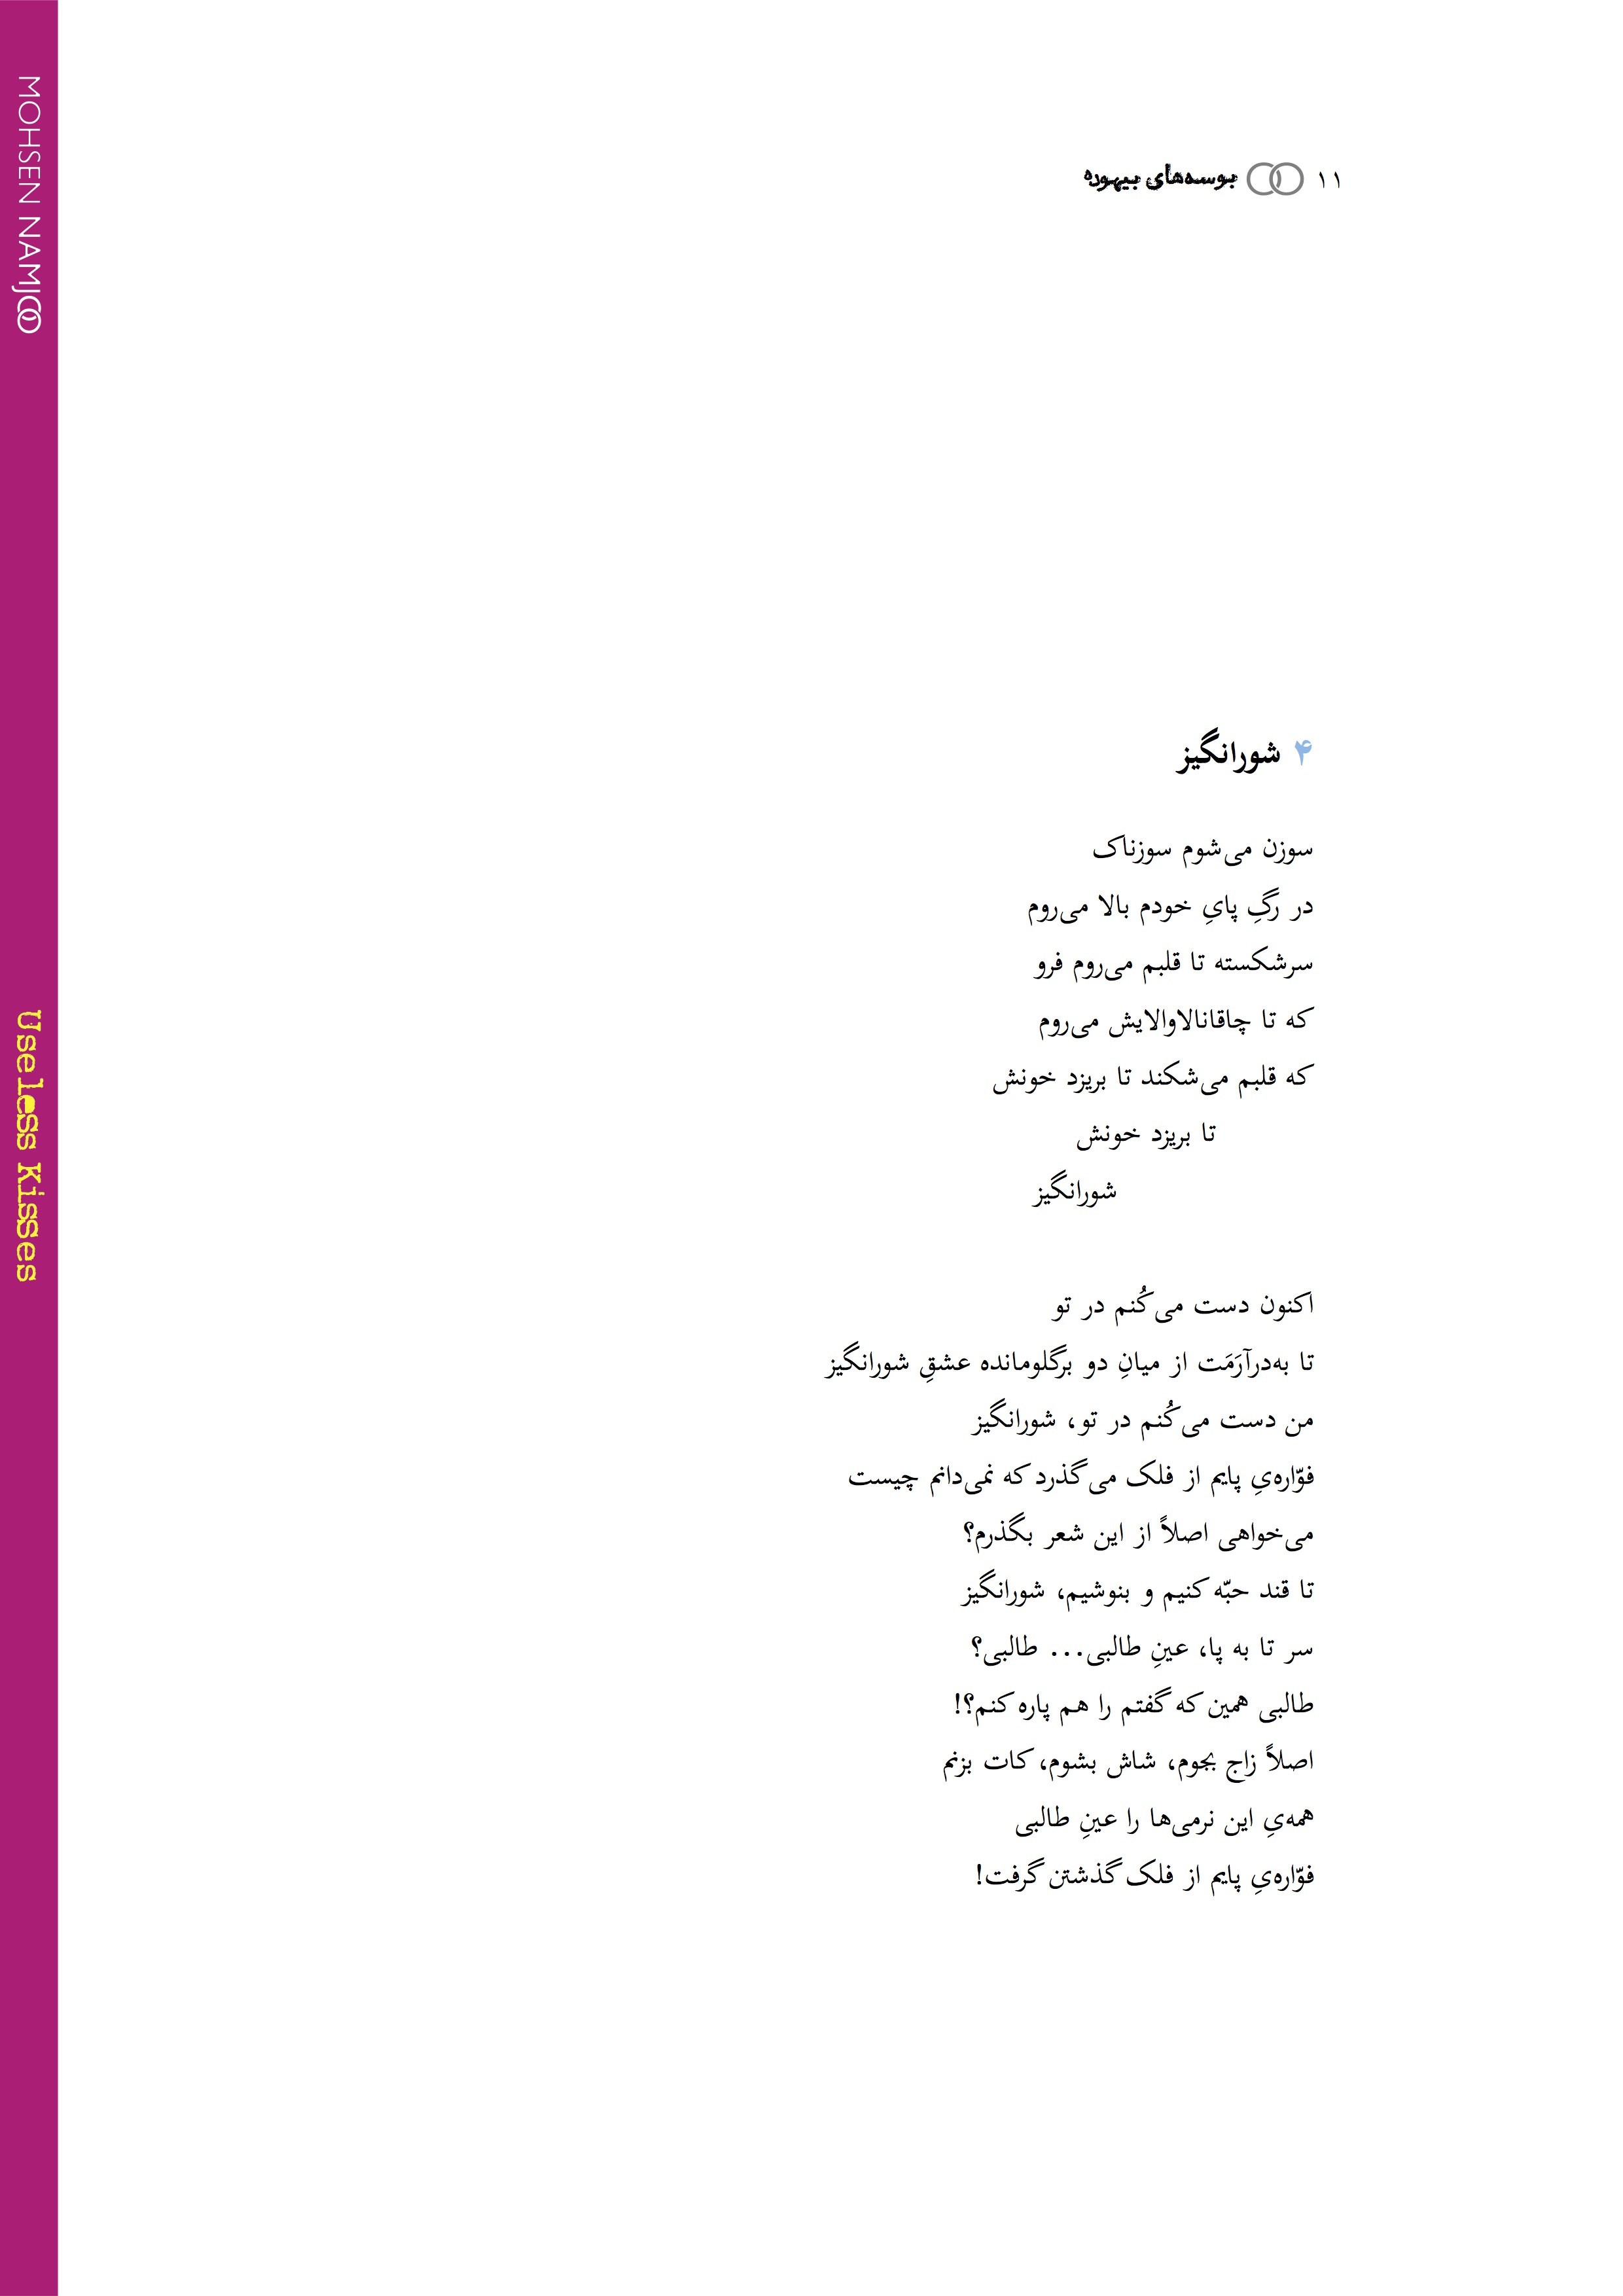 10Useless Kisses eBook (2nd Edition).jpg